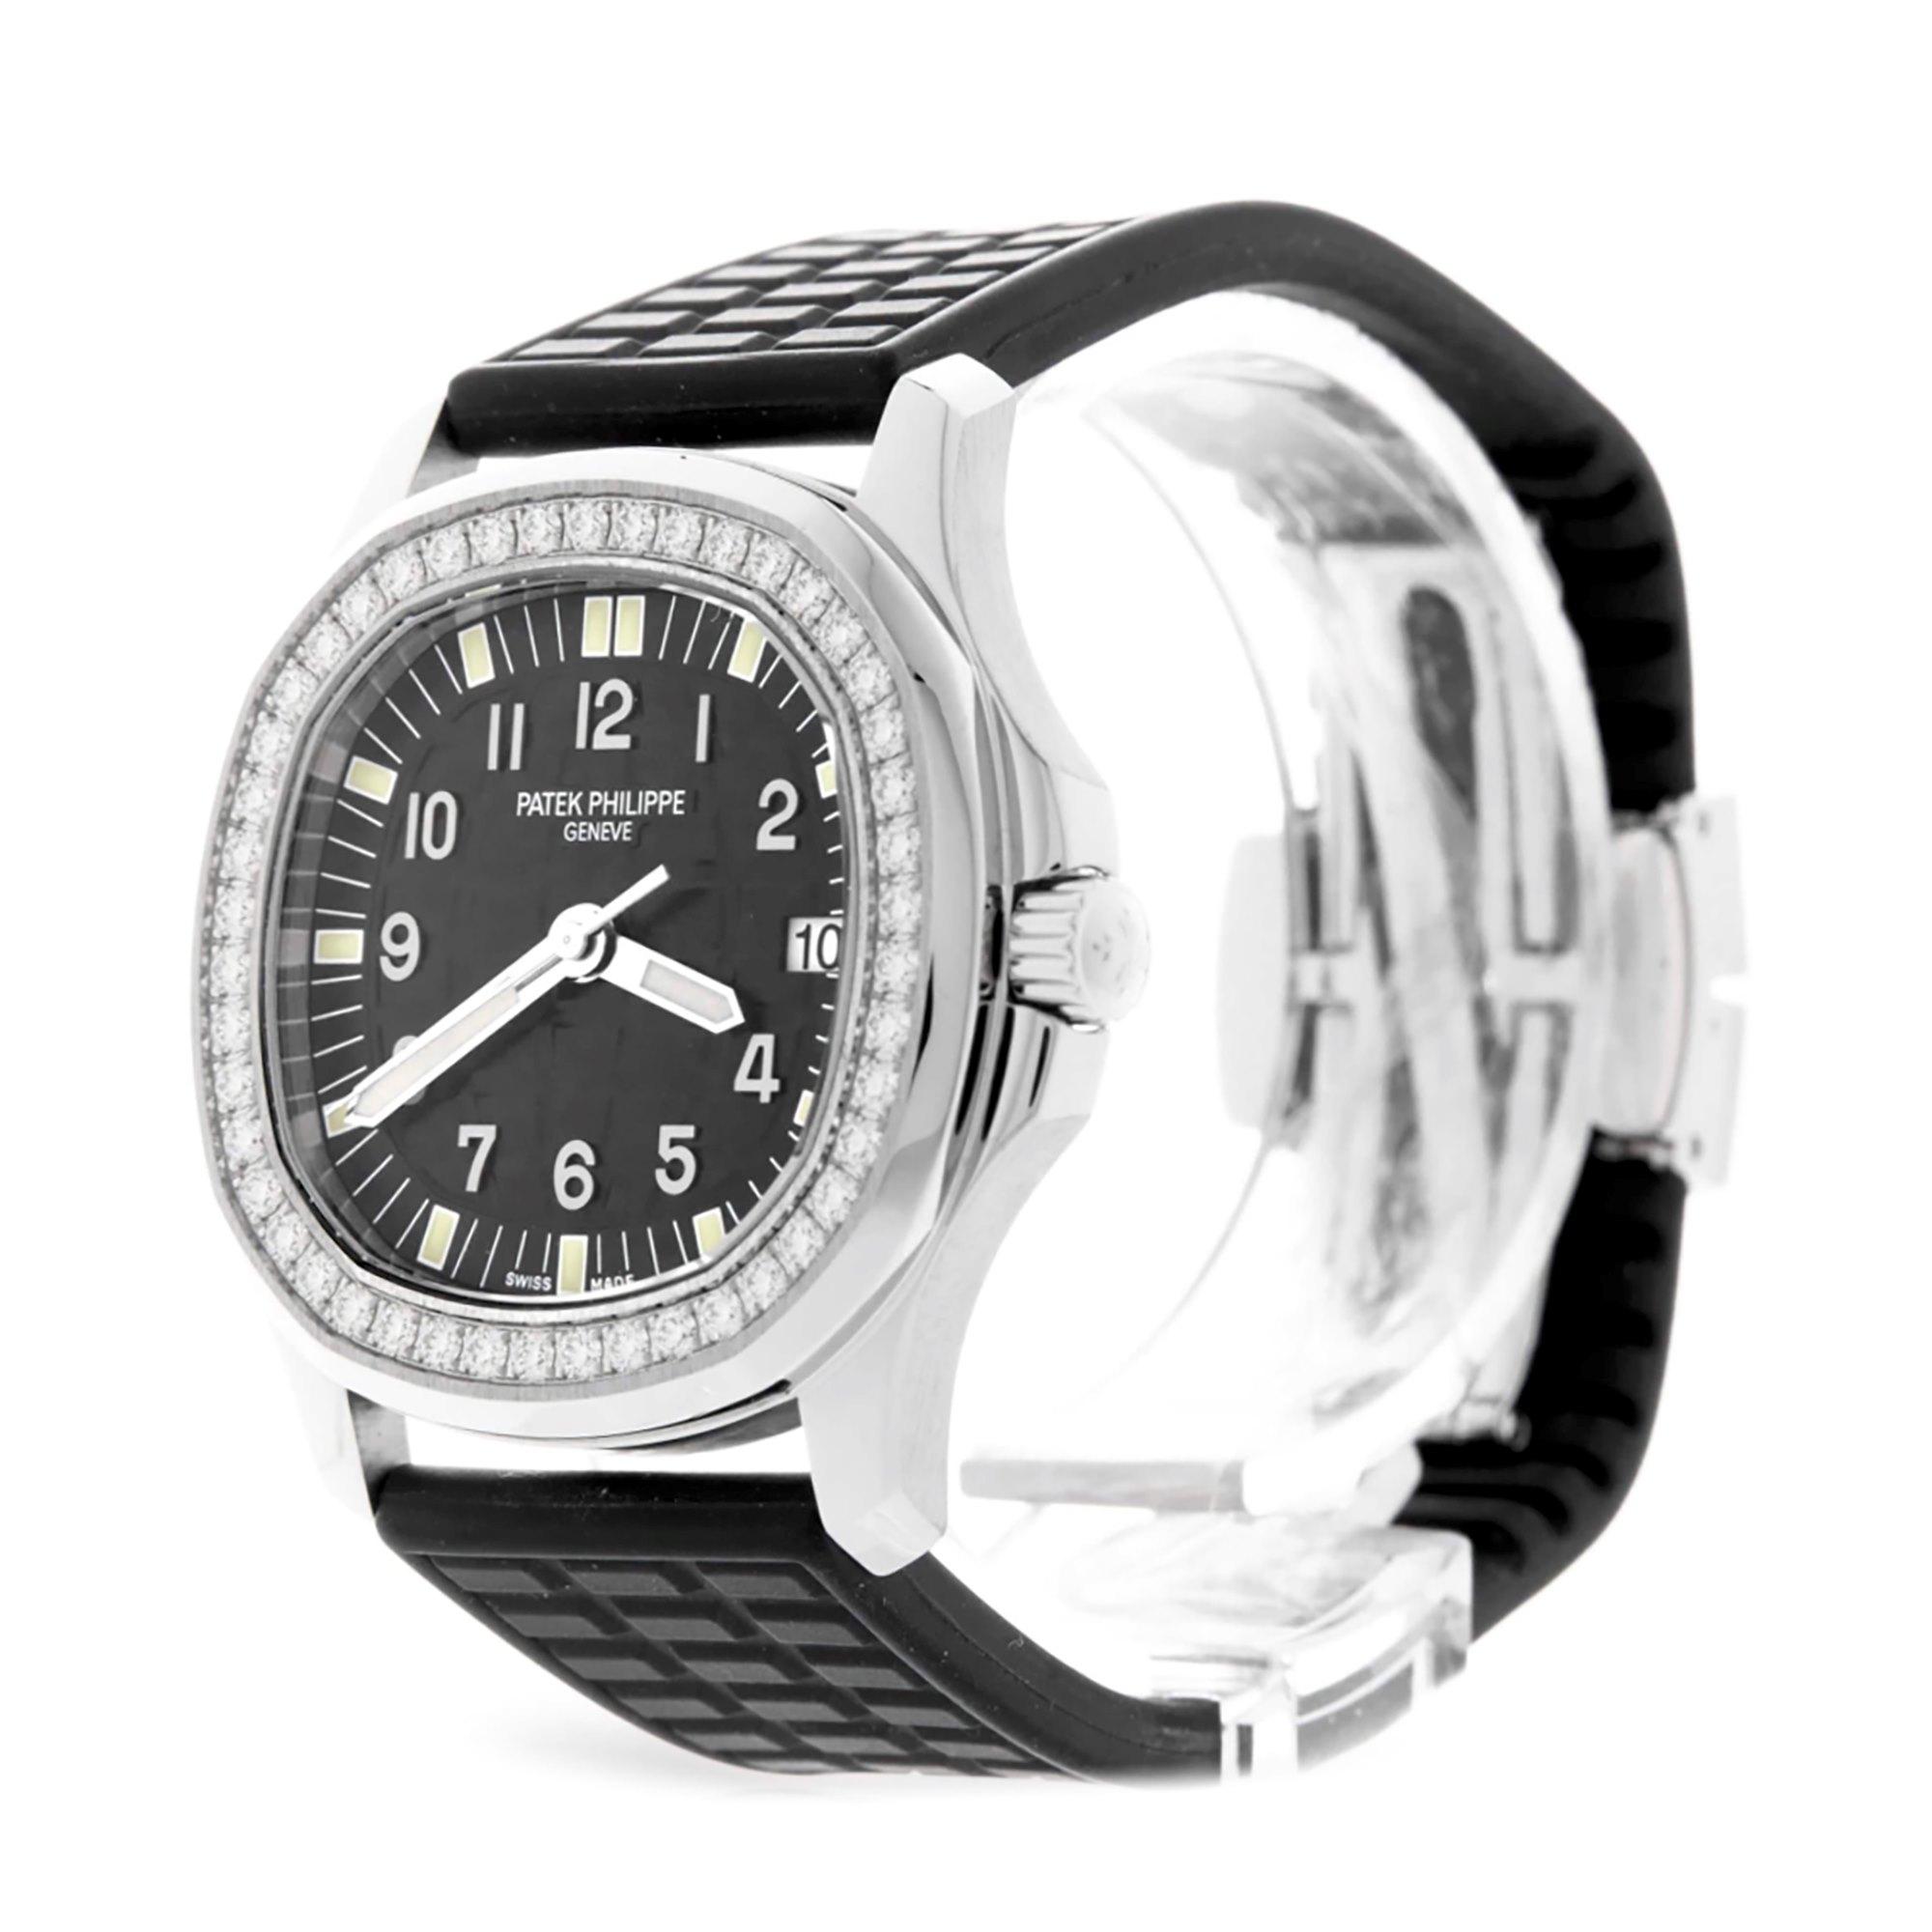 Patek Philippe Aquanaut Roestvrij Staal 5067/A-001